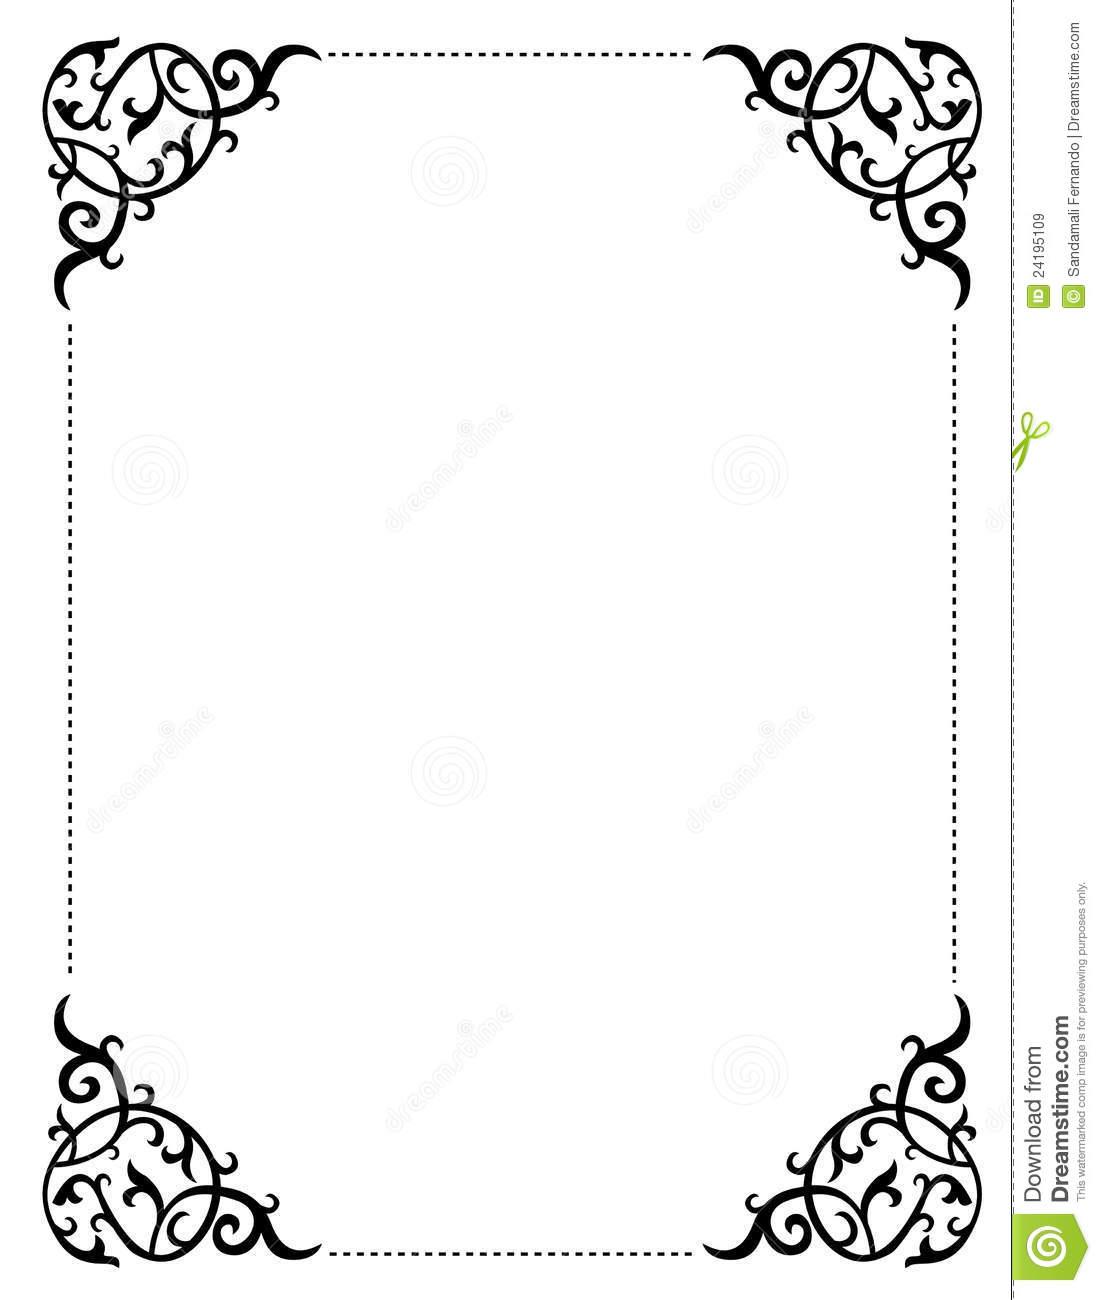 Border Clipart For Wedding Invitation.